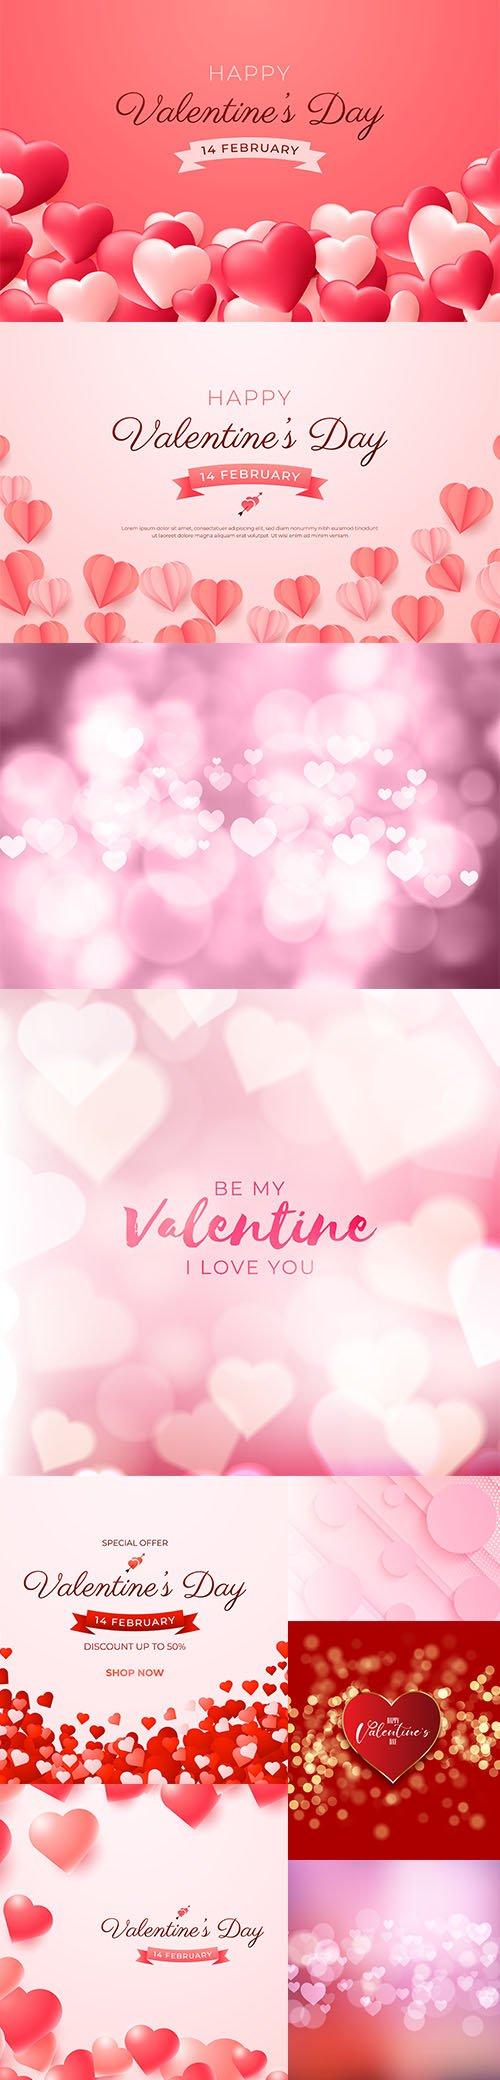 Valentines Day Premium Illustrations Vector Set